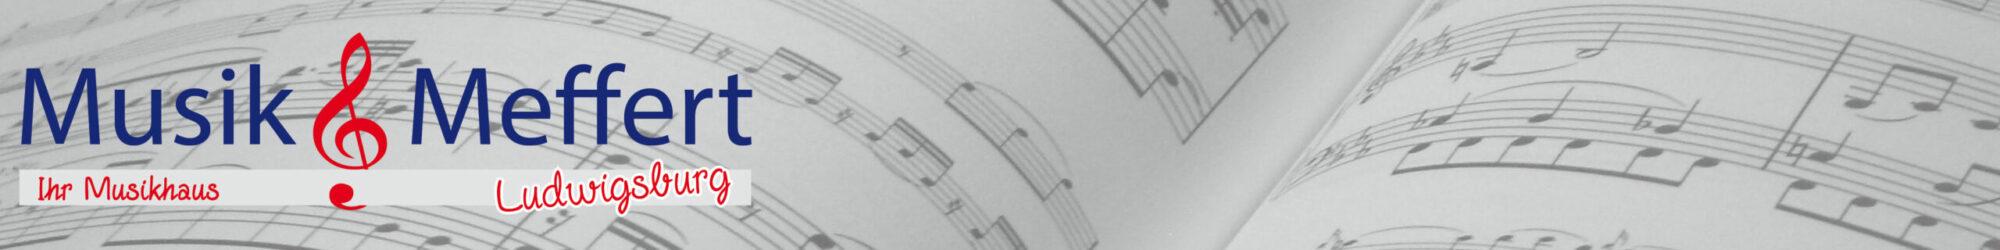 Musik Meffert